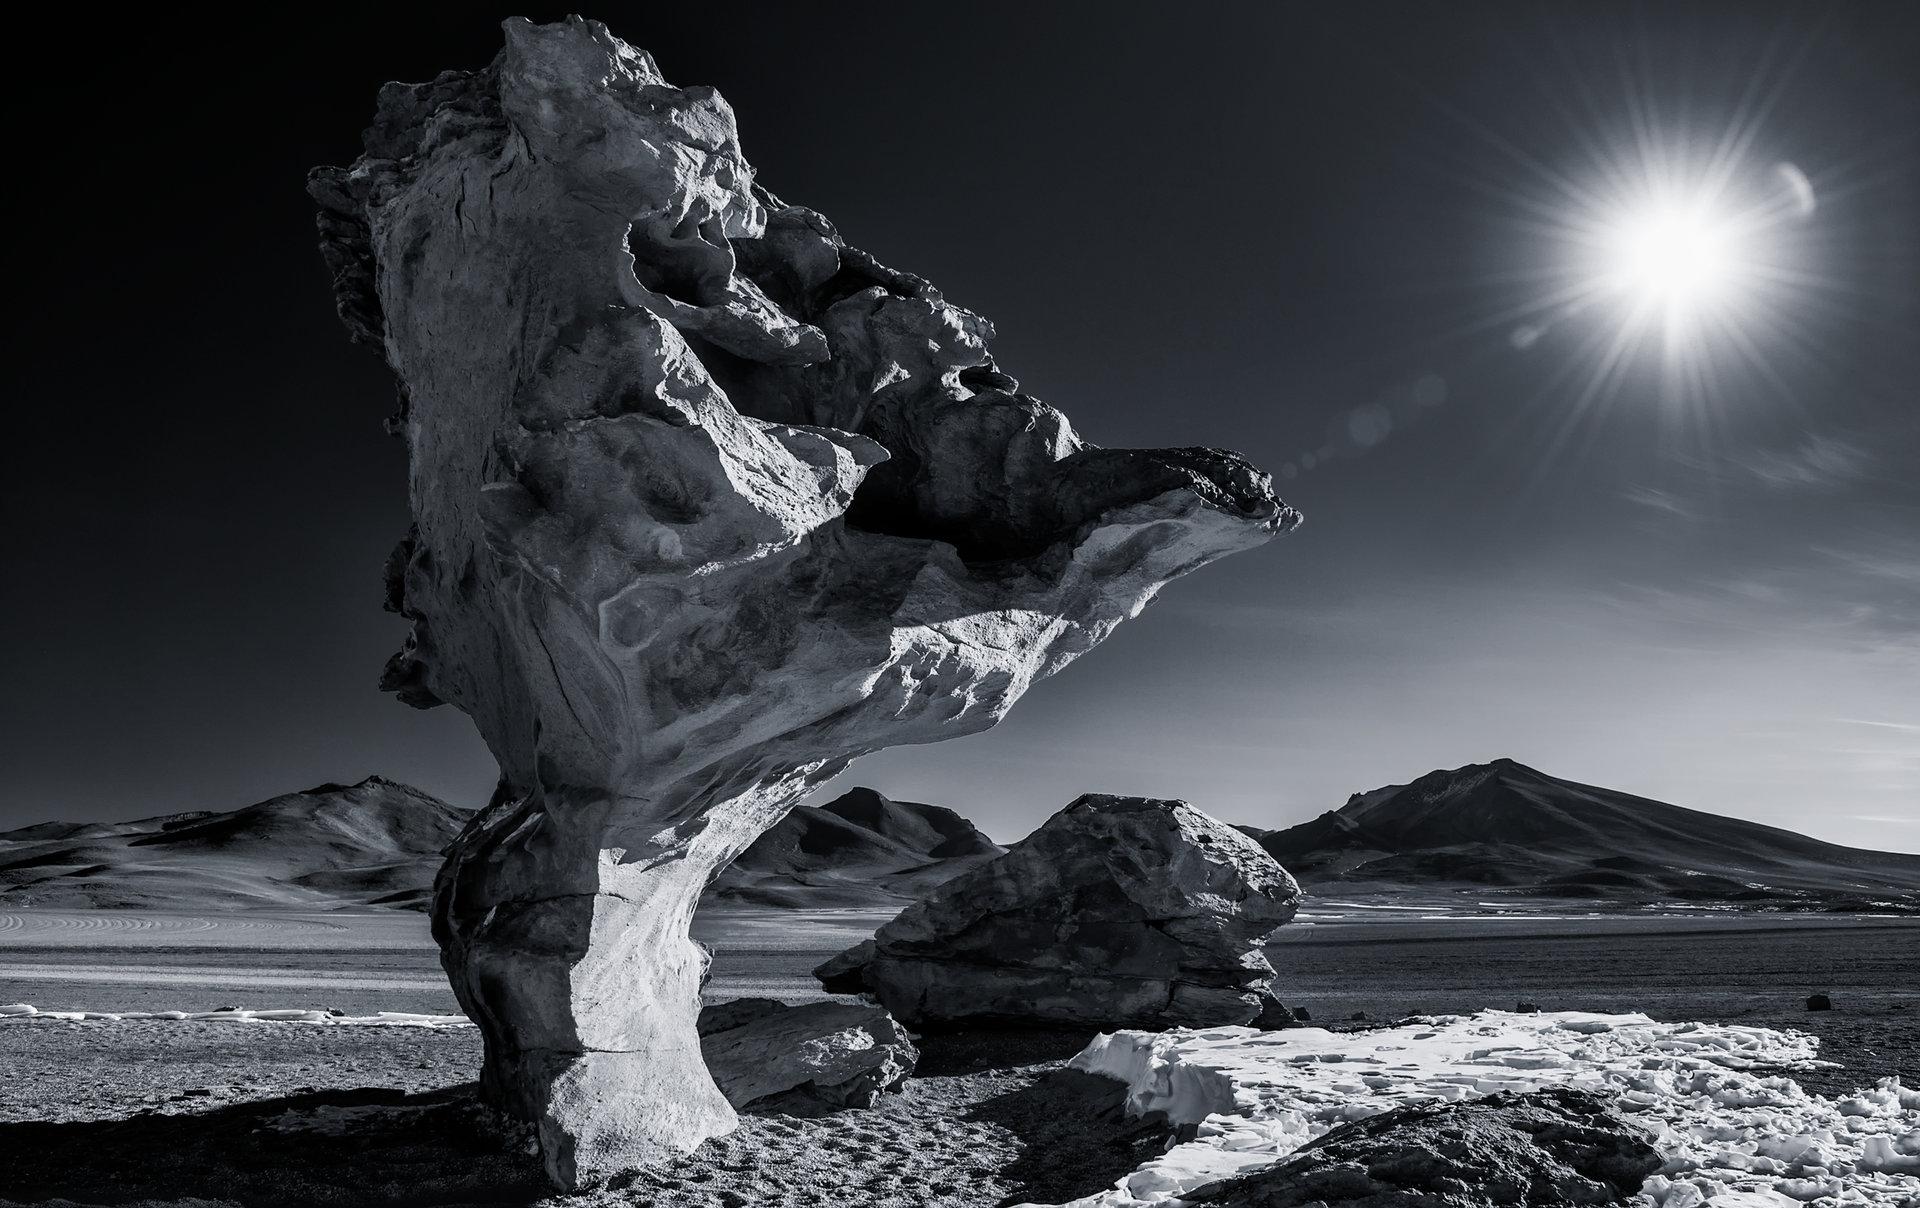 Salar de Uyuni, Bolivia | Author HITTHEROAD | PHOTO FORUM